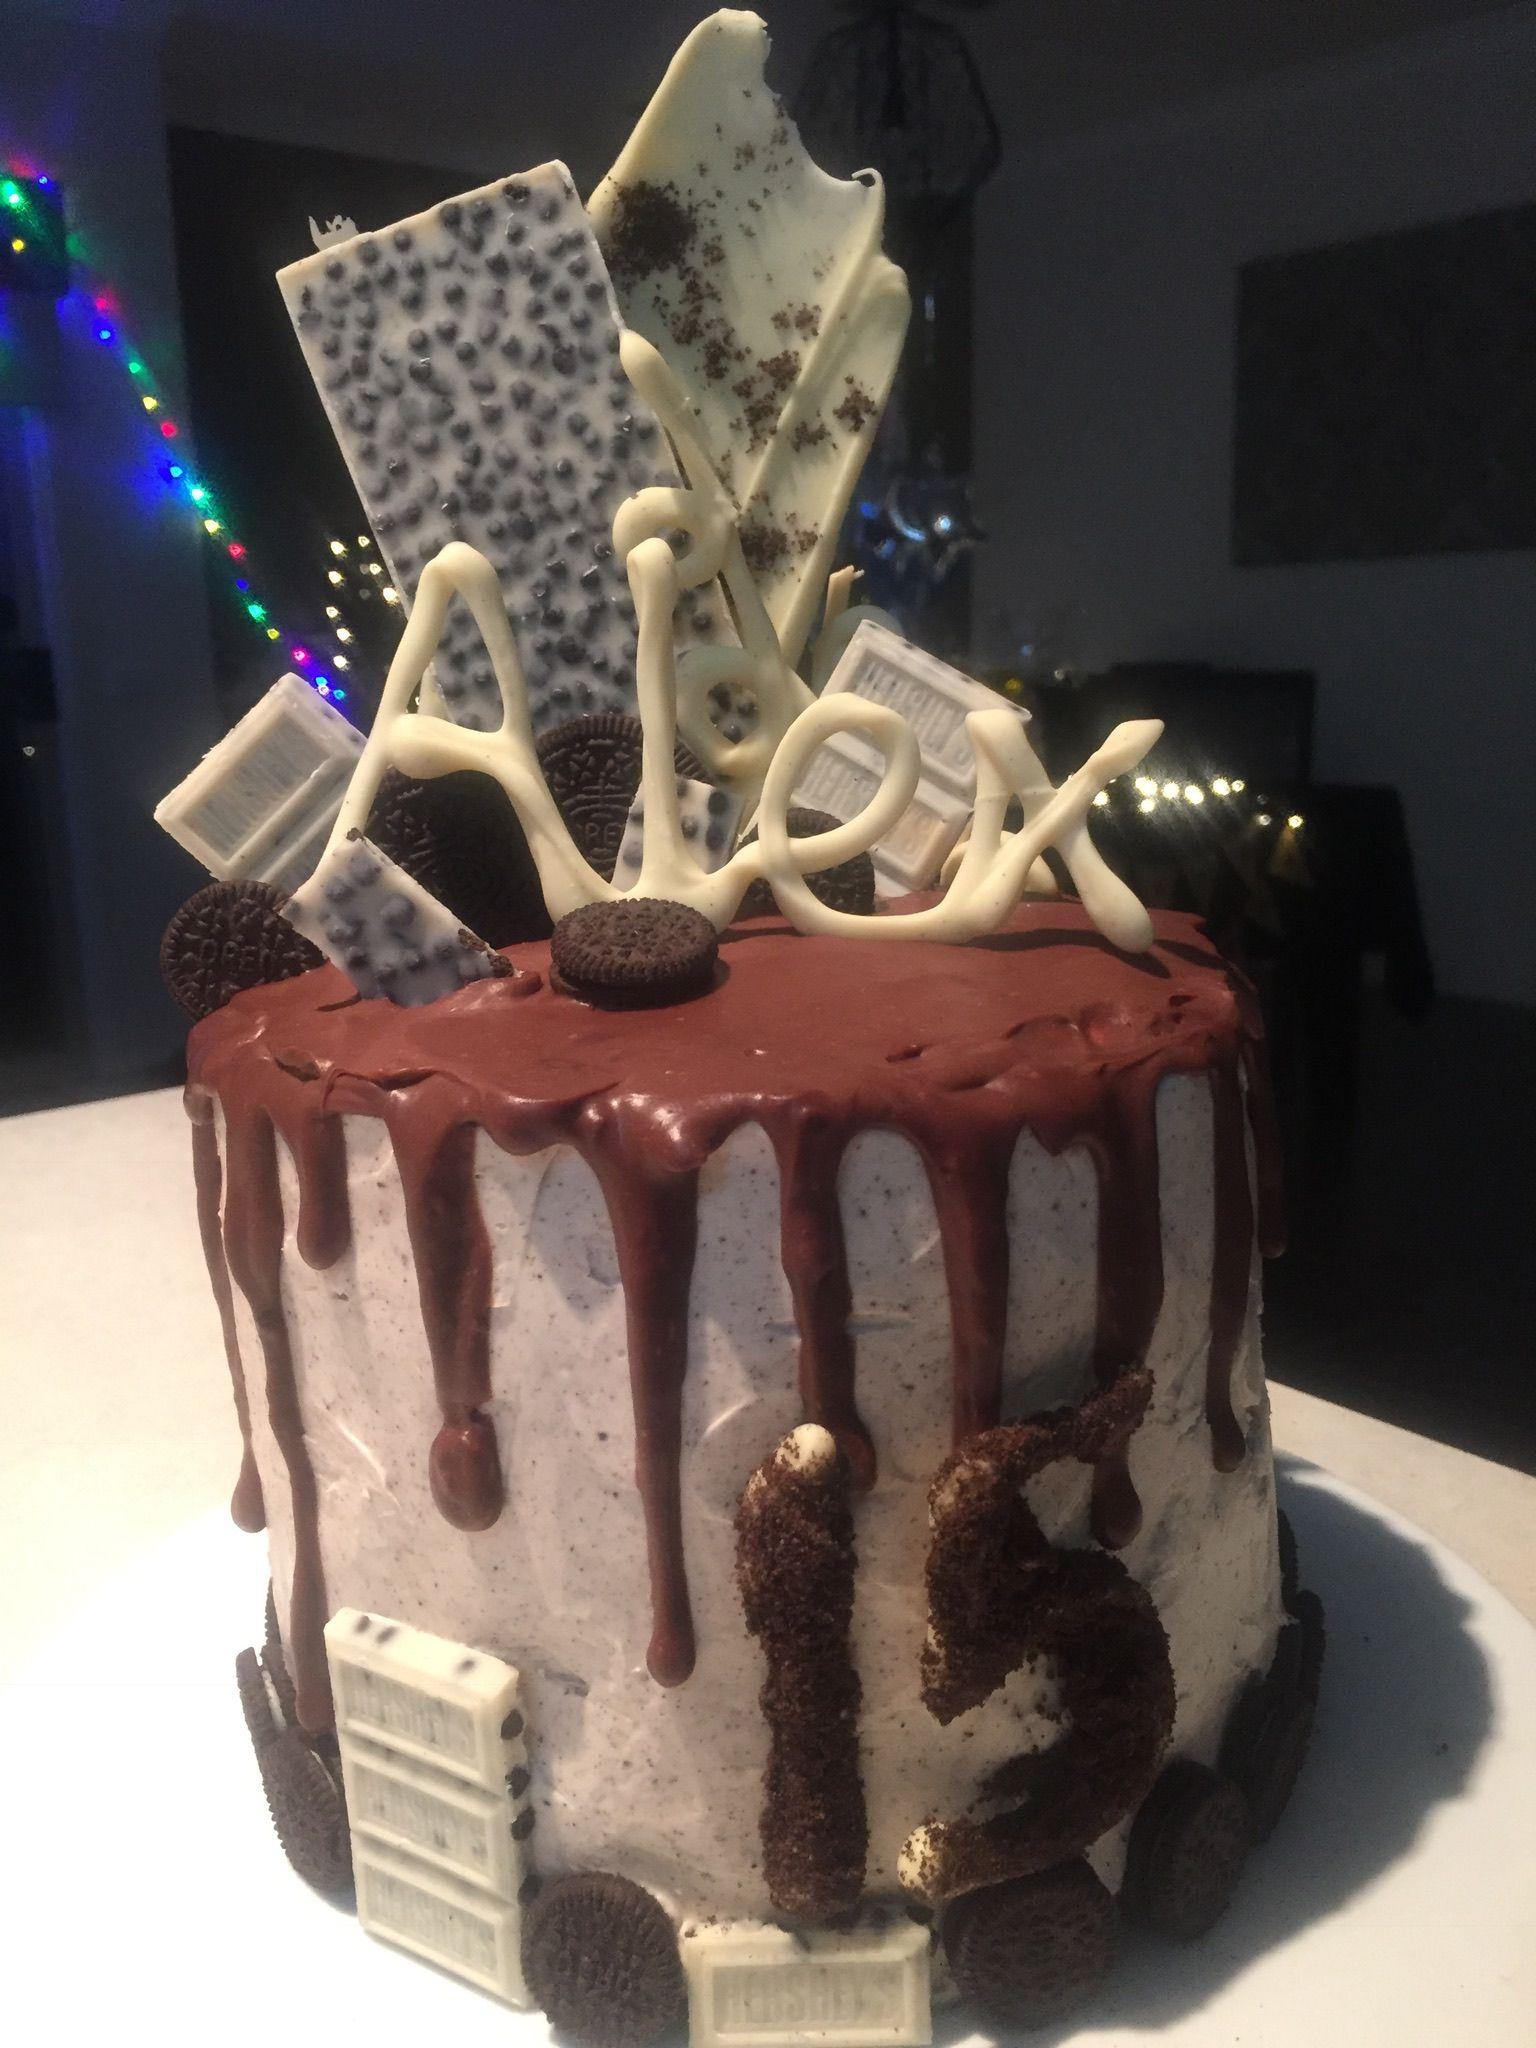 15th birthday cake 15th birthday cakes cake birthday cake